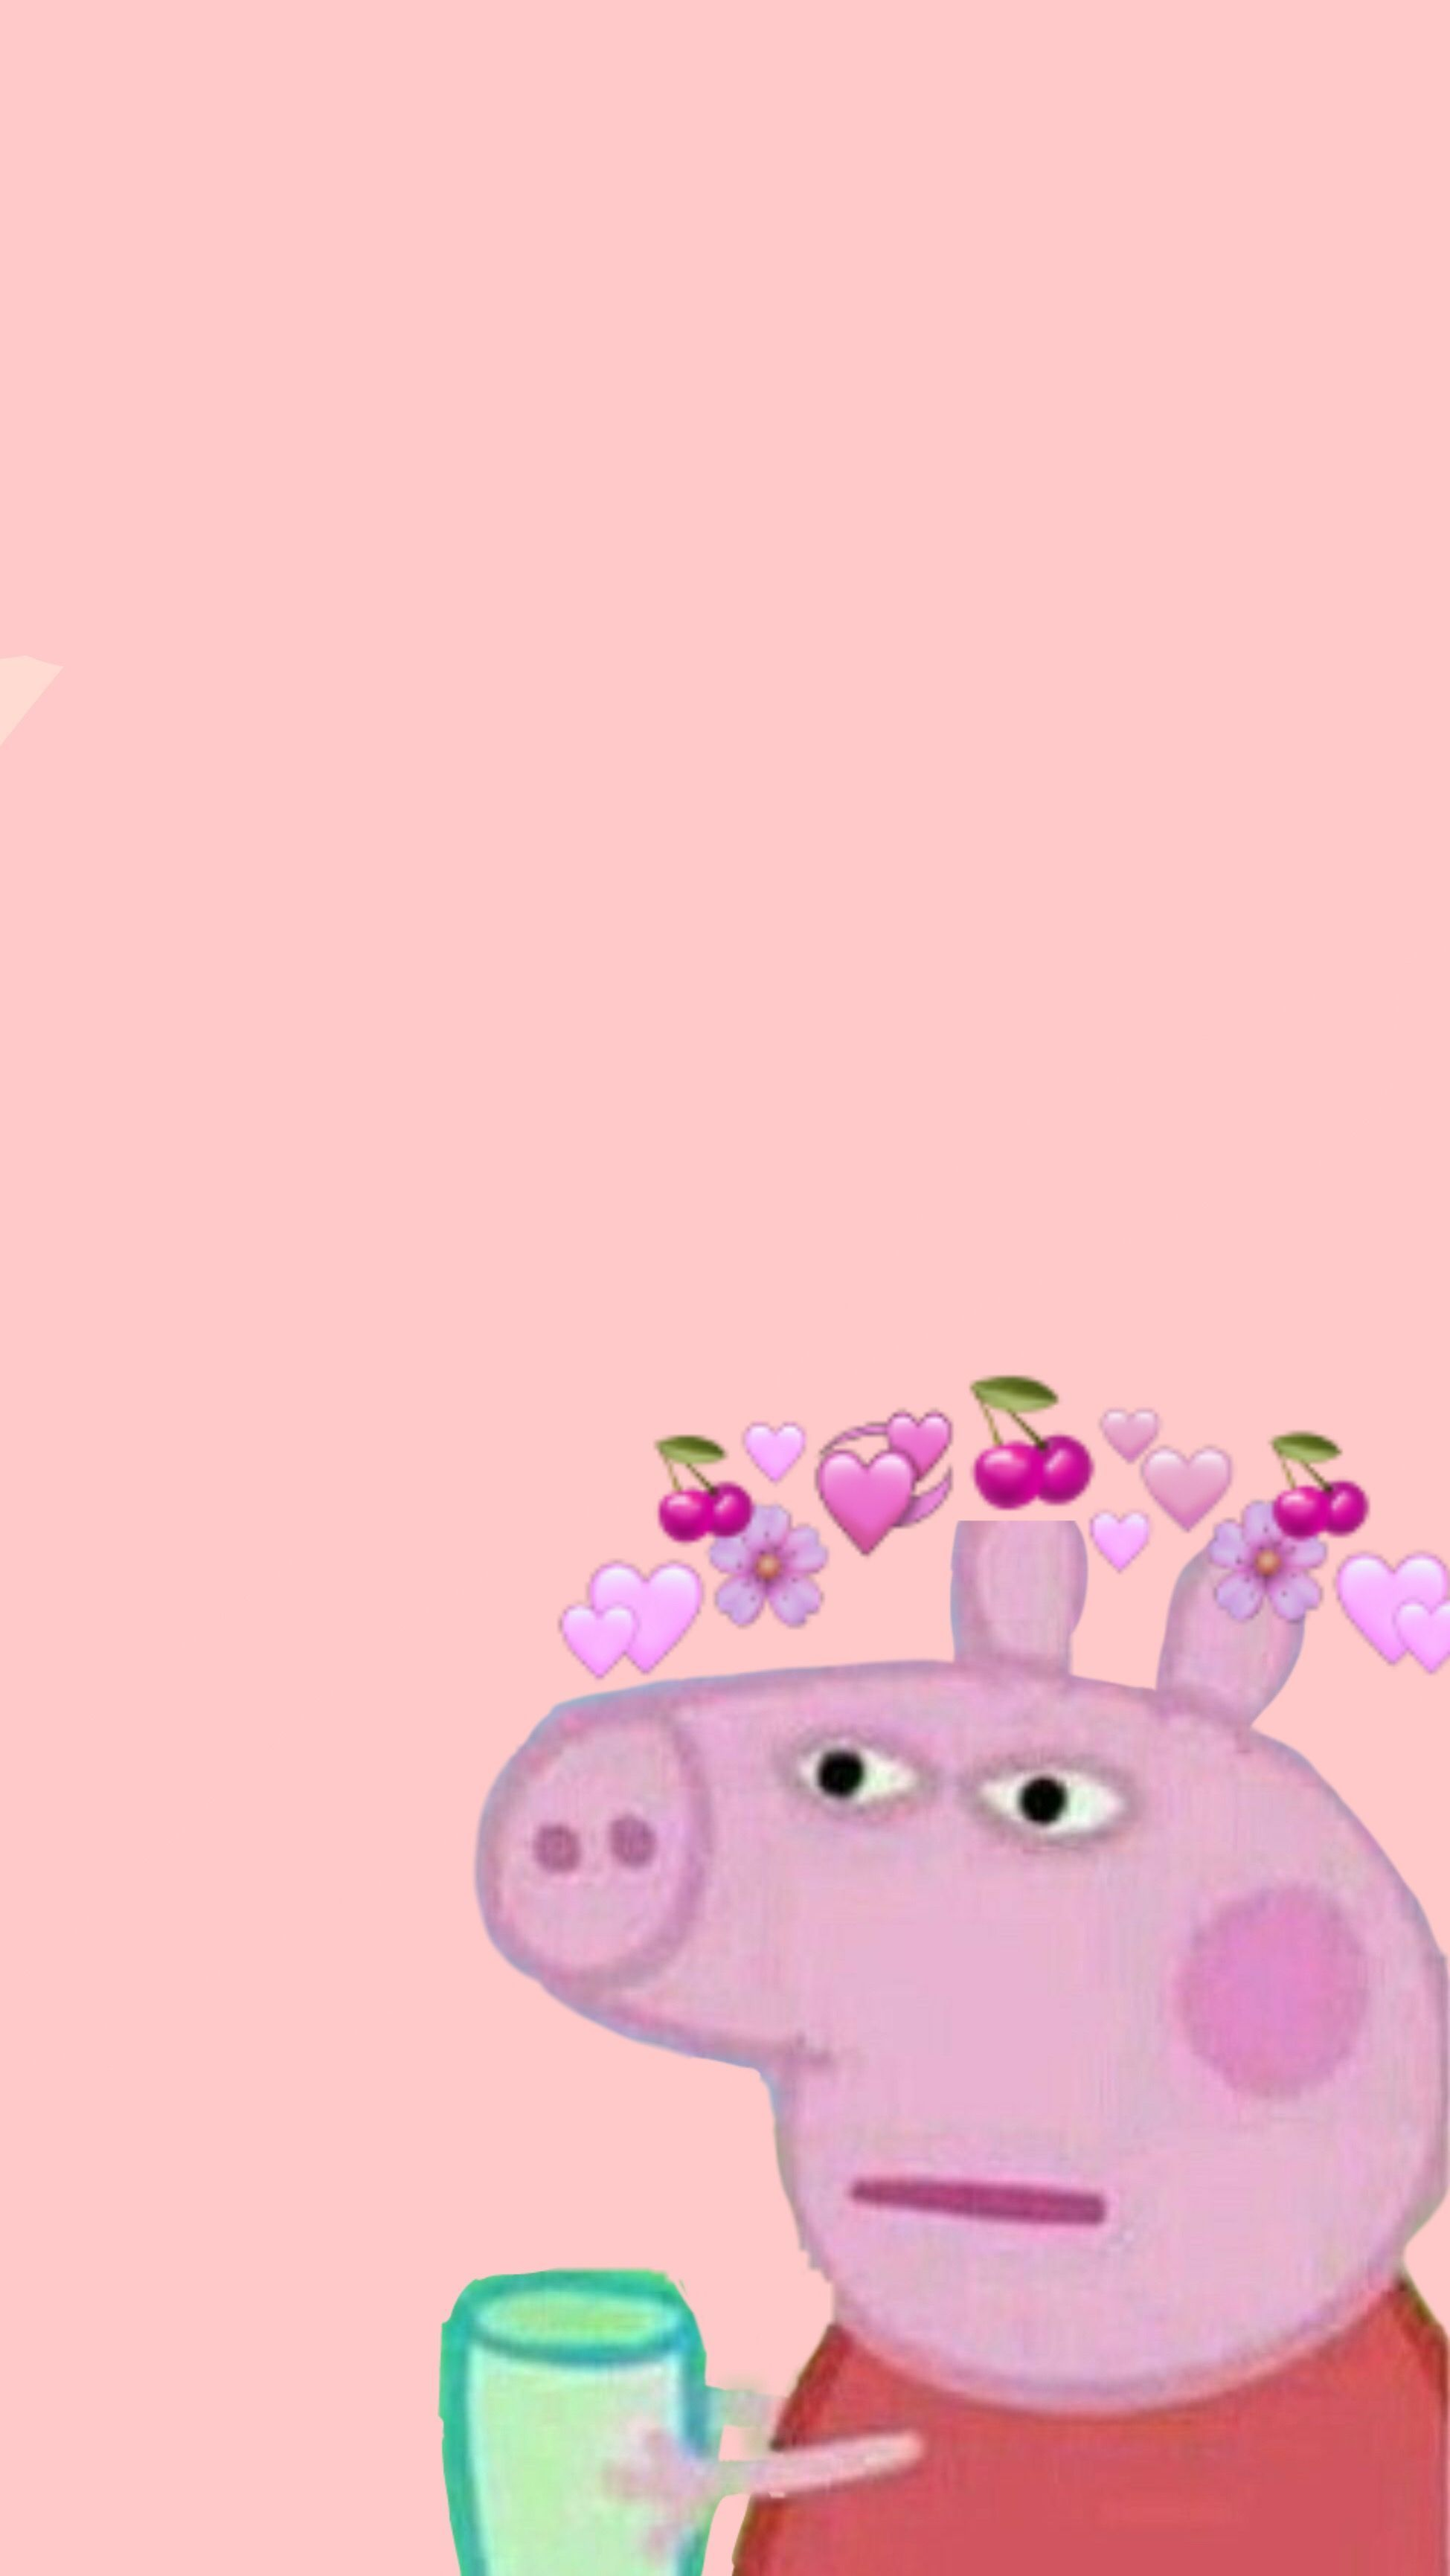 Peppa Pig Desktop Backgrounds Hd   Peppa 1949x3463